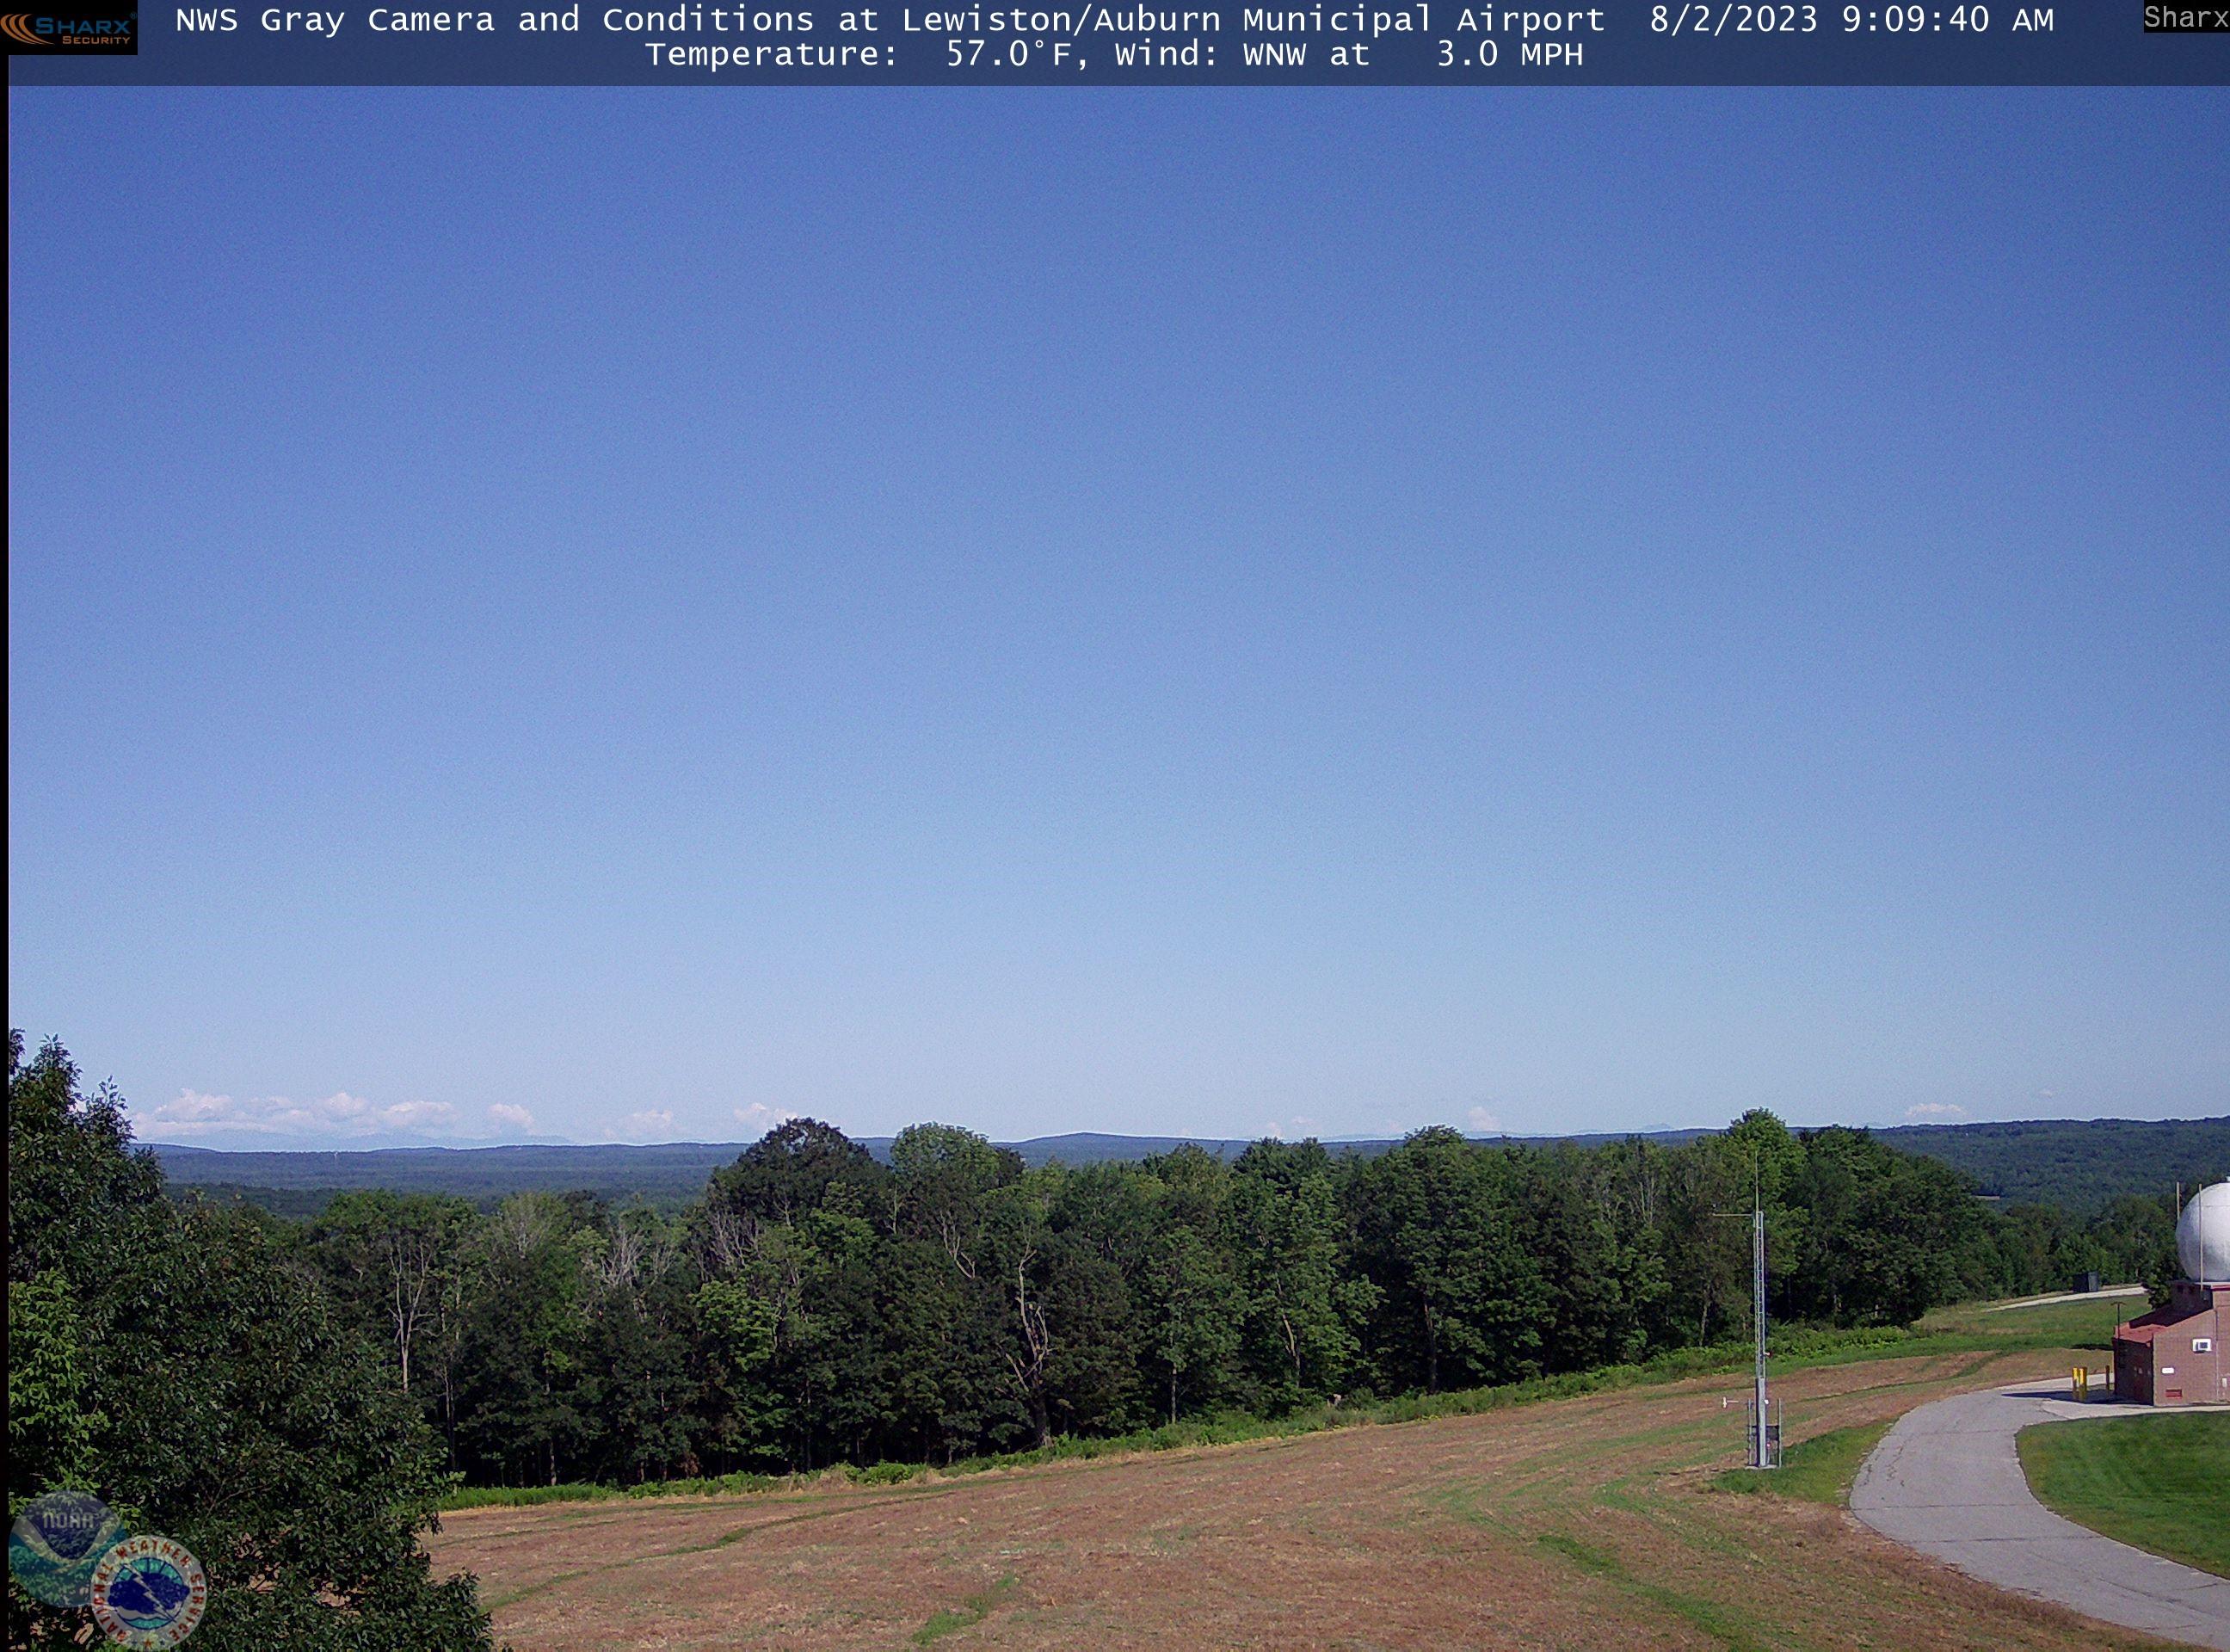 Lewiston/Auburn Municipal Airport Webcams